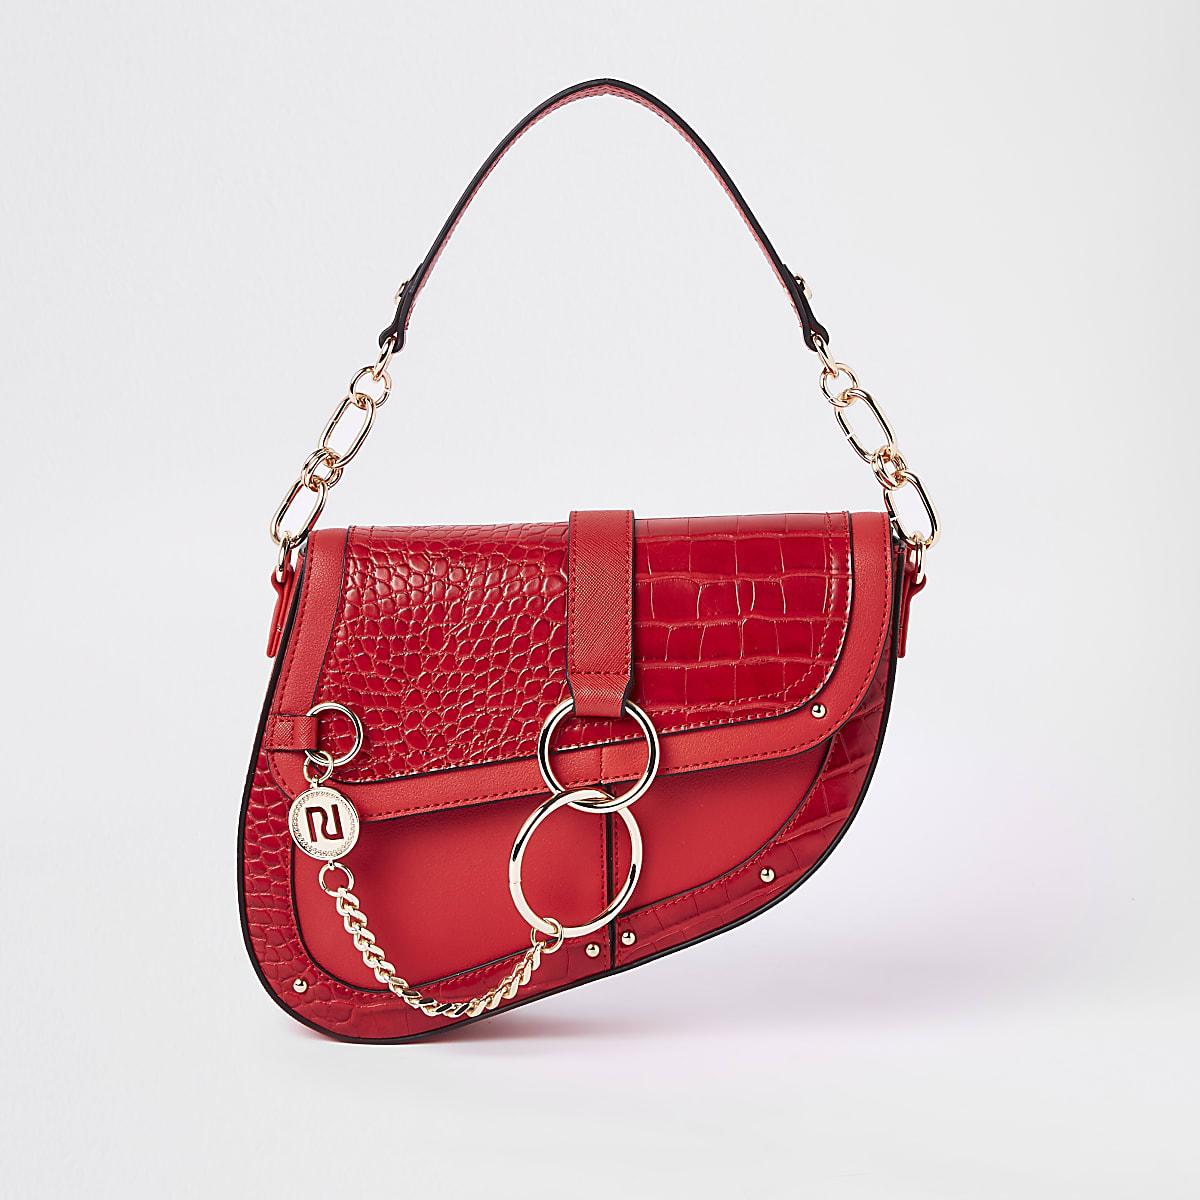 Red croc embossed saddle underarm bag